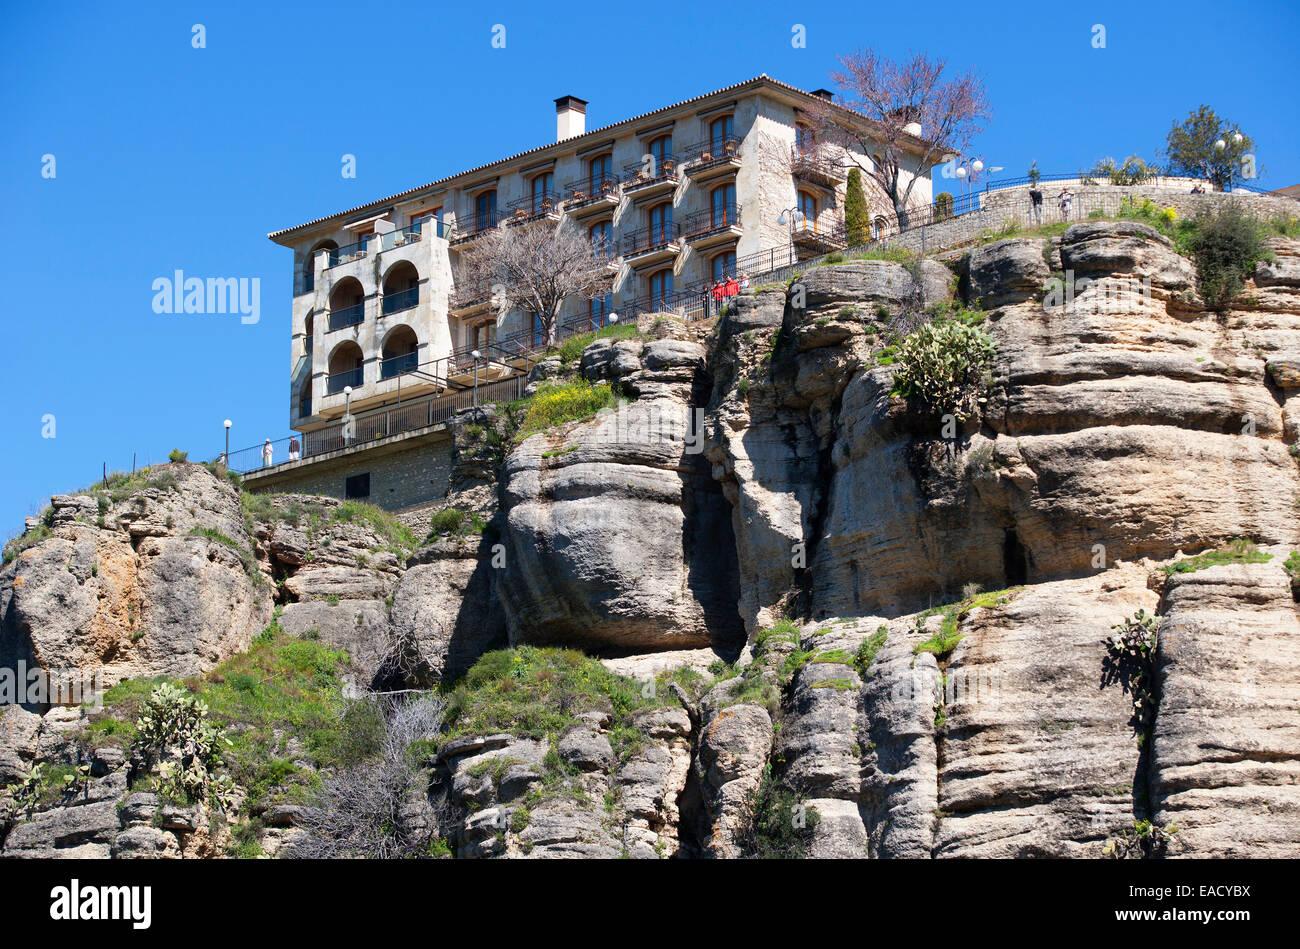 Parador de Turismo, hotel, historic centre, Ronda, Province of Malaga, Andalusia, Spain - Stock Image